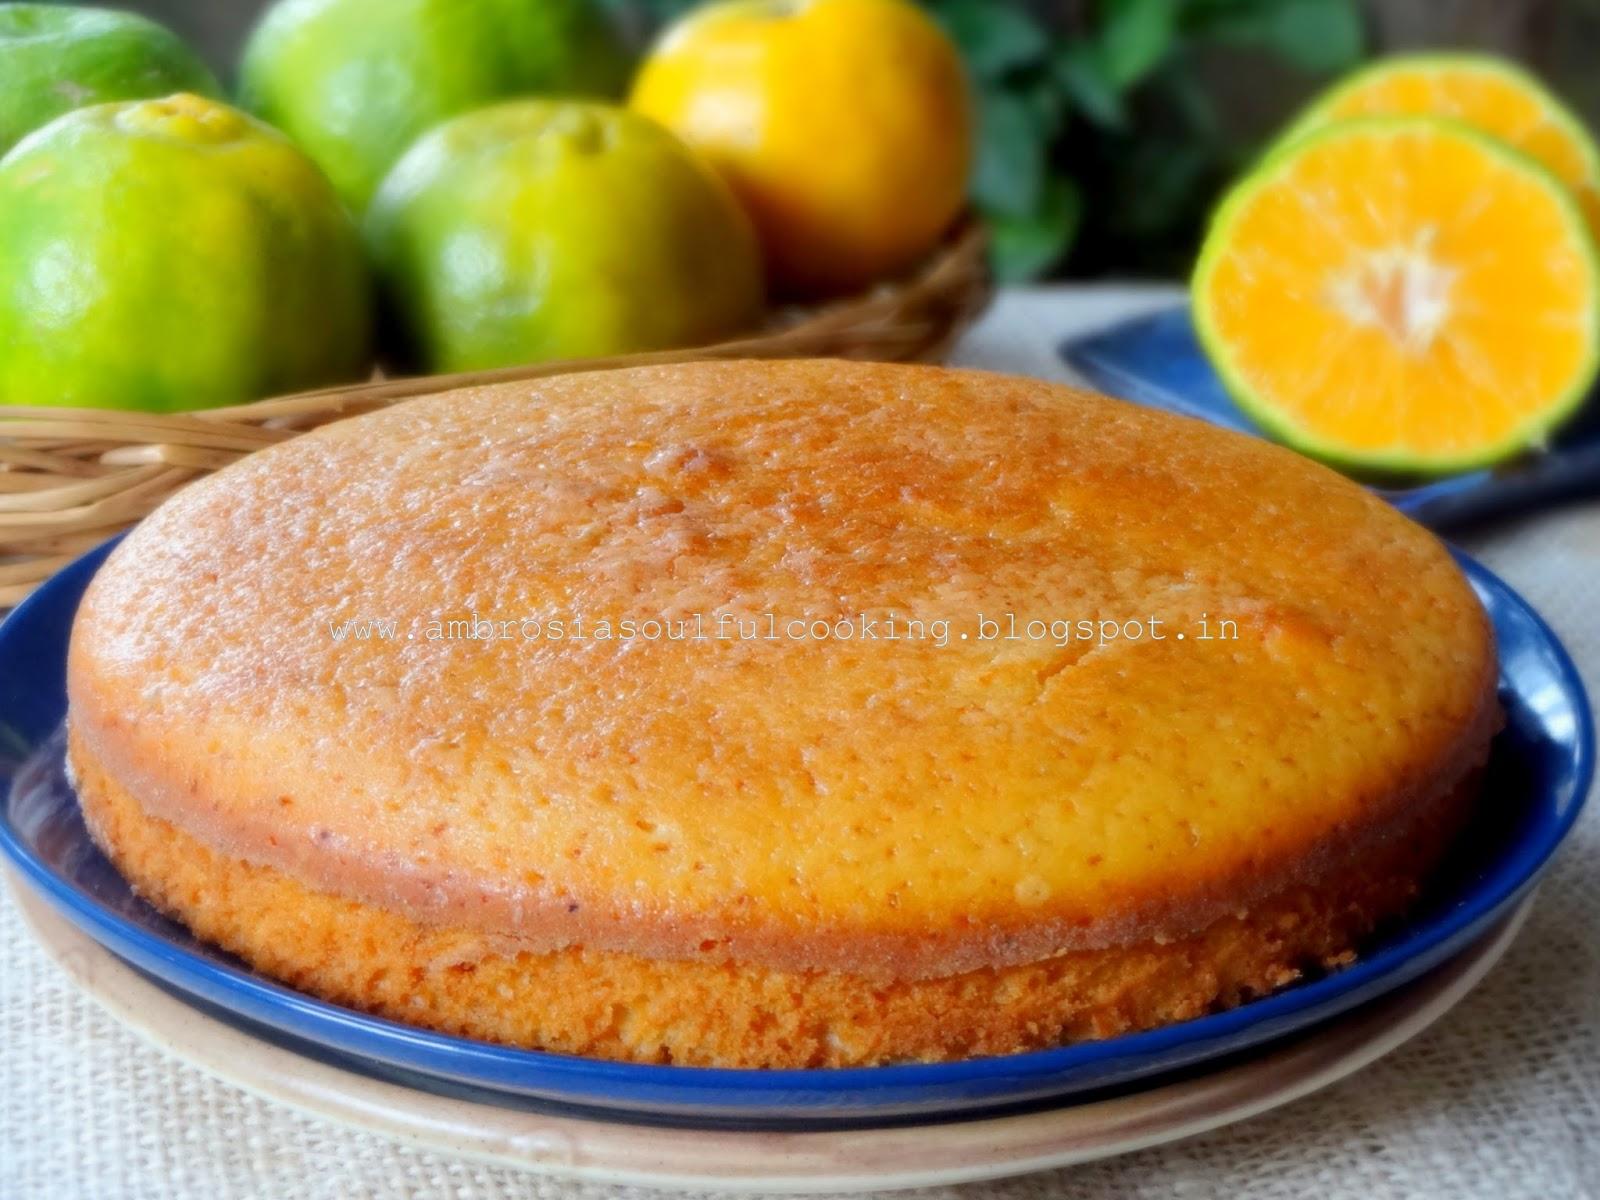 Cake Recipe With Low Fat Yogurt: Low Fat Orange Yogurt Cake